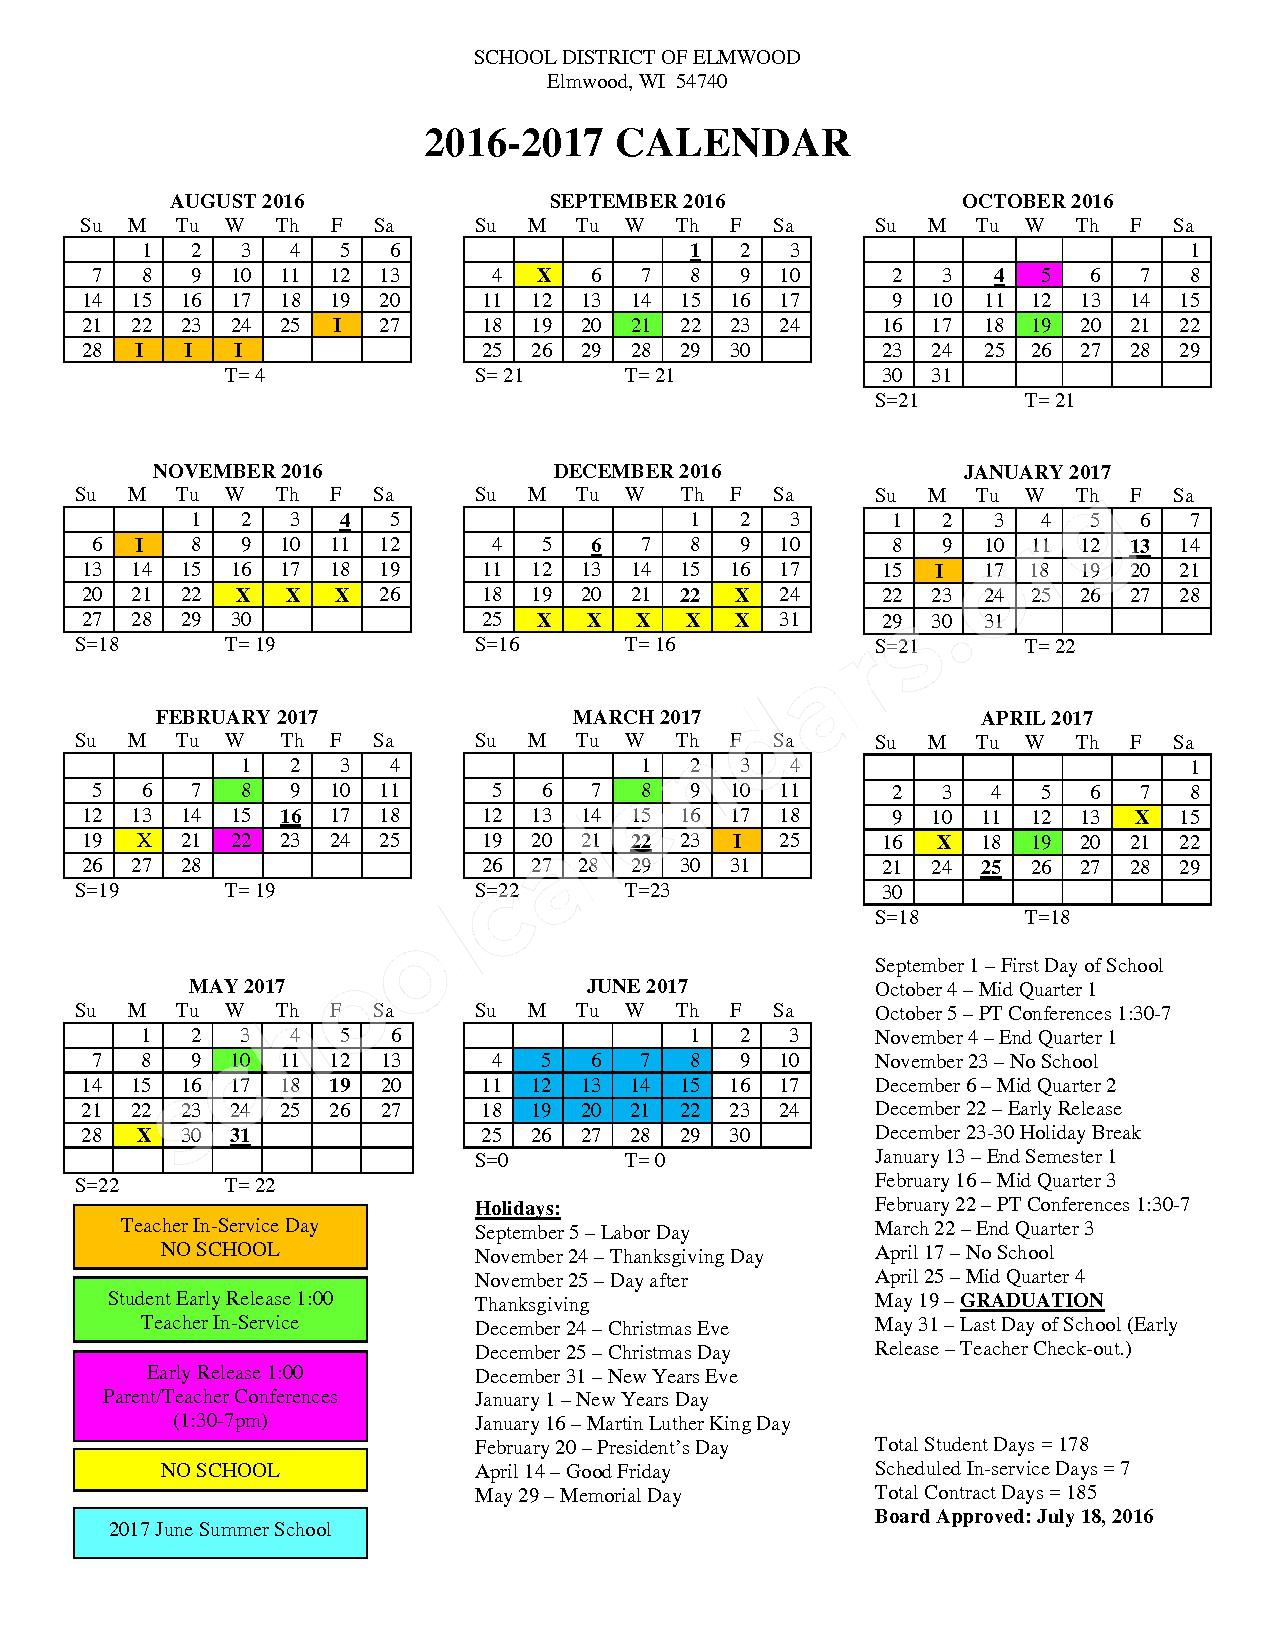 2016 - 2017 District Calendar – Elmwood School District – page 1